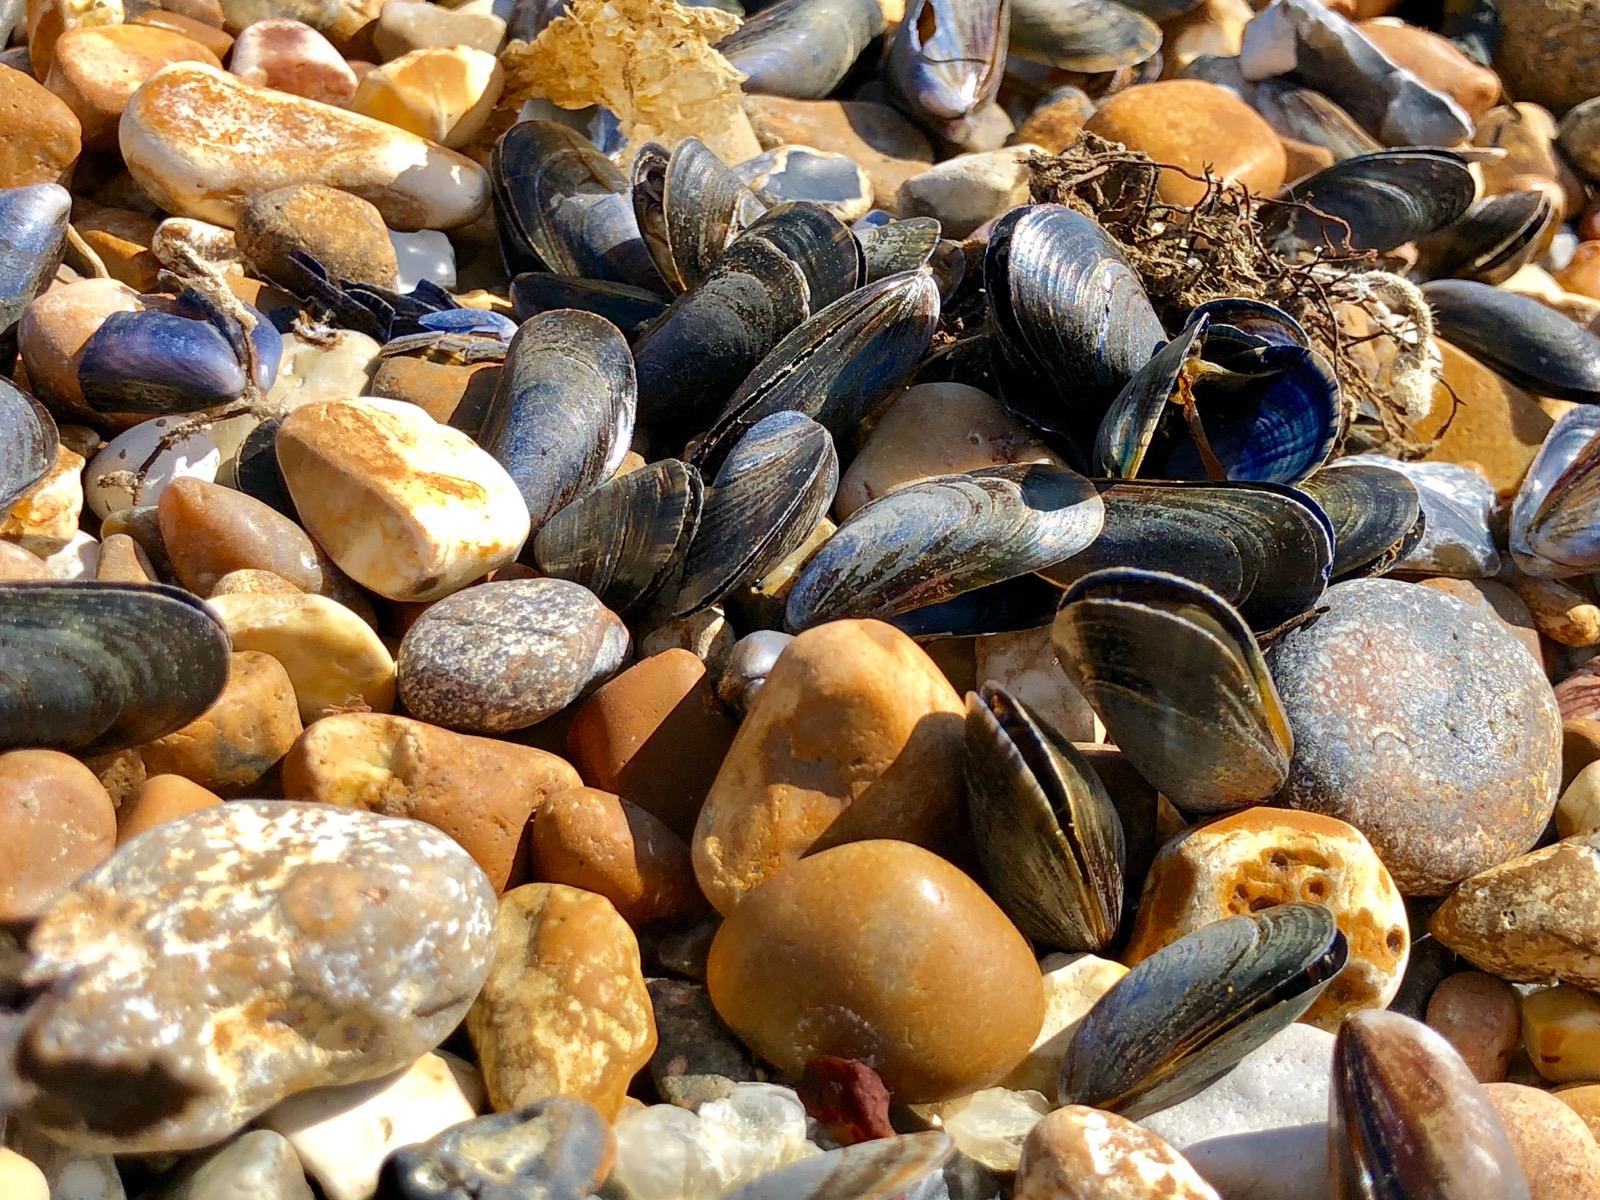 Down on Shoreham Beach